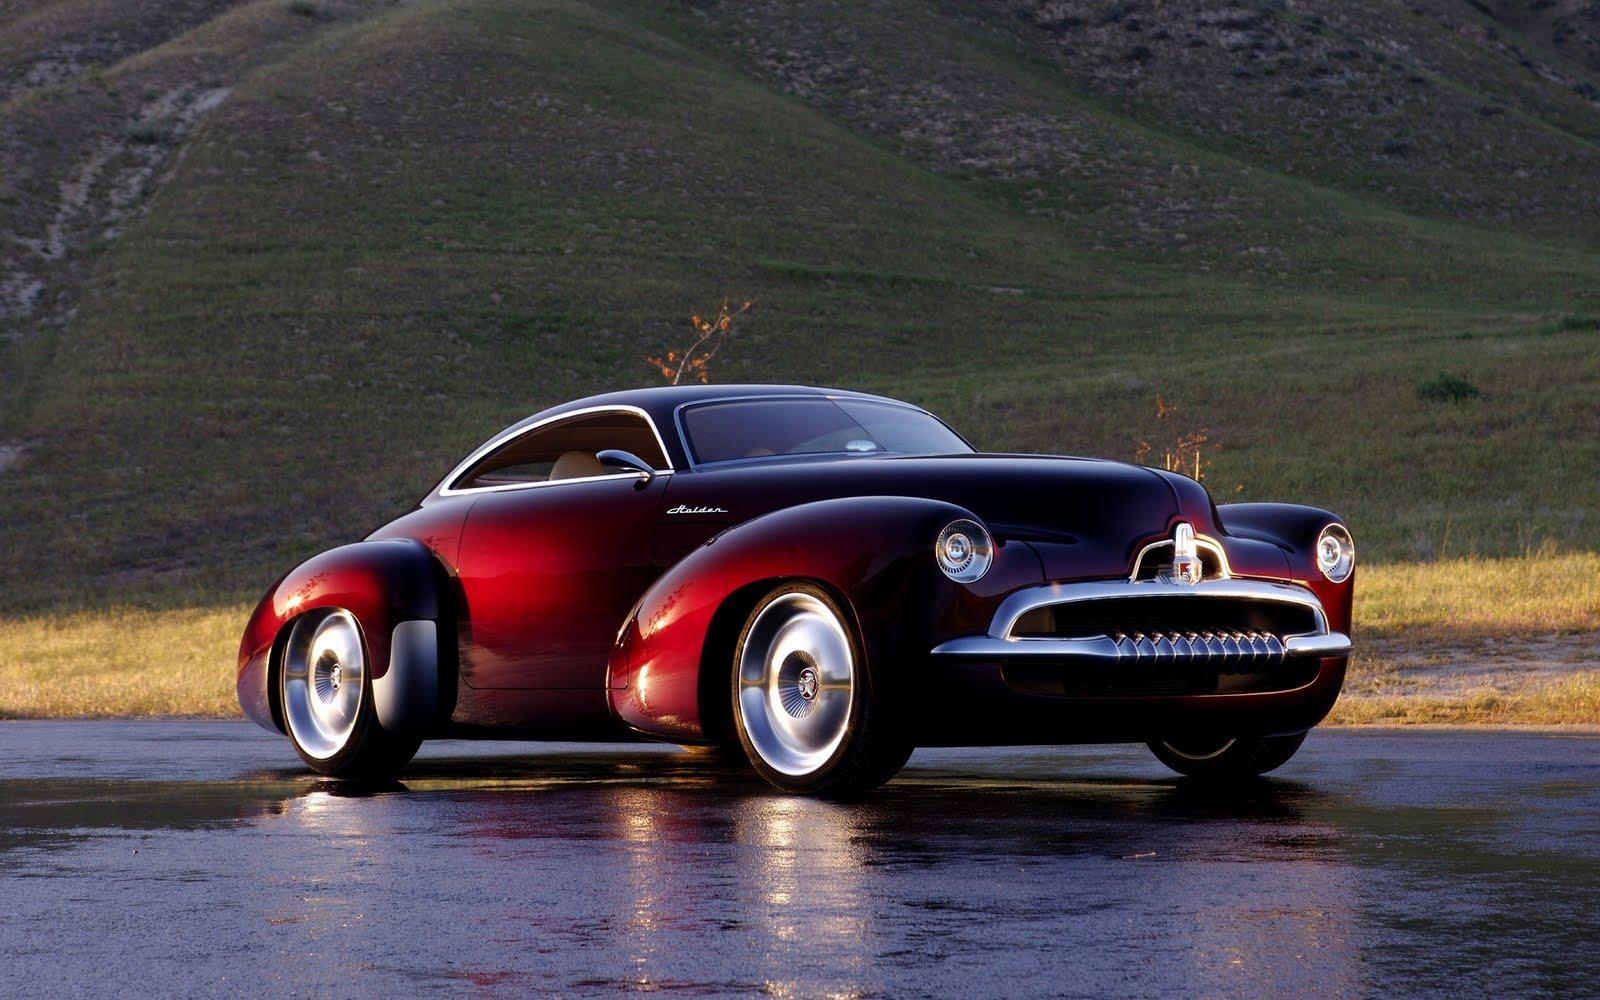 http://2.bp.blogspot.com/-CBI-M1_MRg4/TiHfvTKutnI/AAAAAAAAB5w/RQ5F5RwCOkU/s1600/Holden+Efijy+Concept+01+1920X1200+Deluxe+Car+Wallpaper.jpg